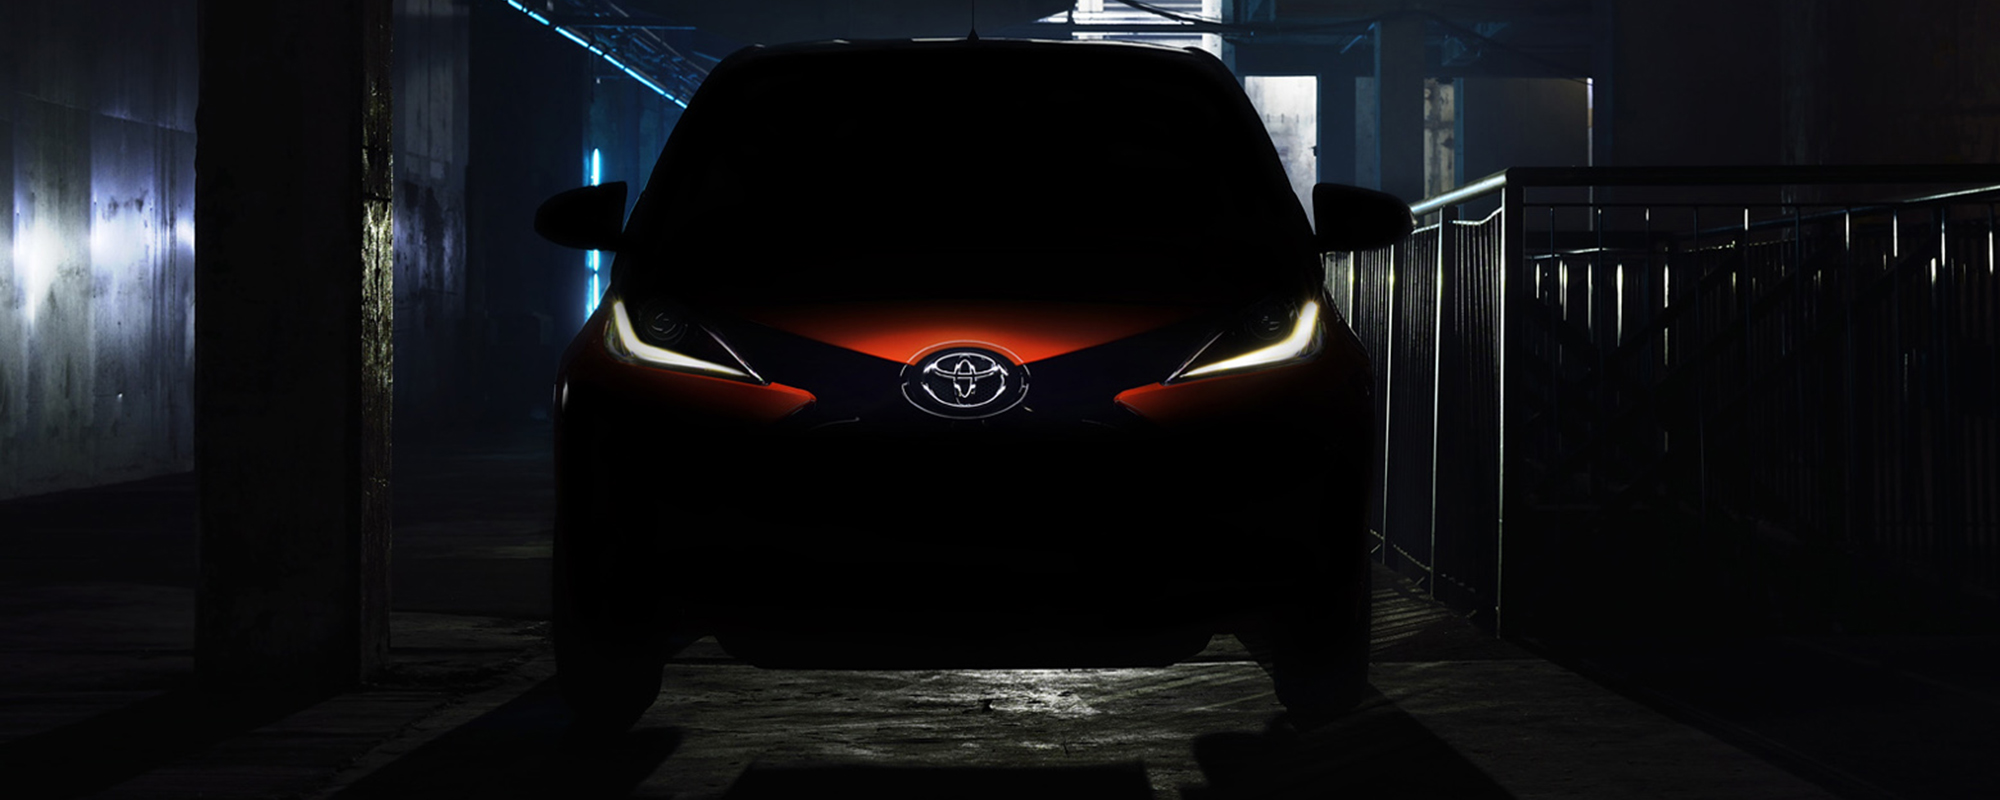 Toyota geeft AYGO lekker eigenzinnig design